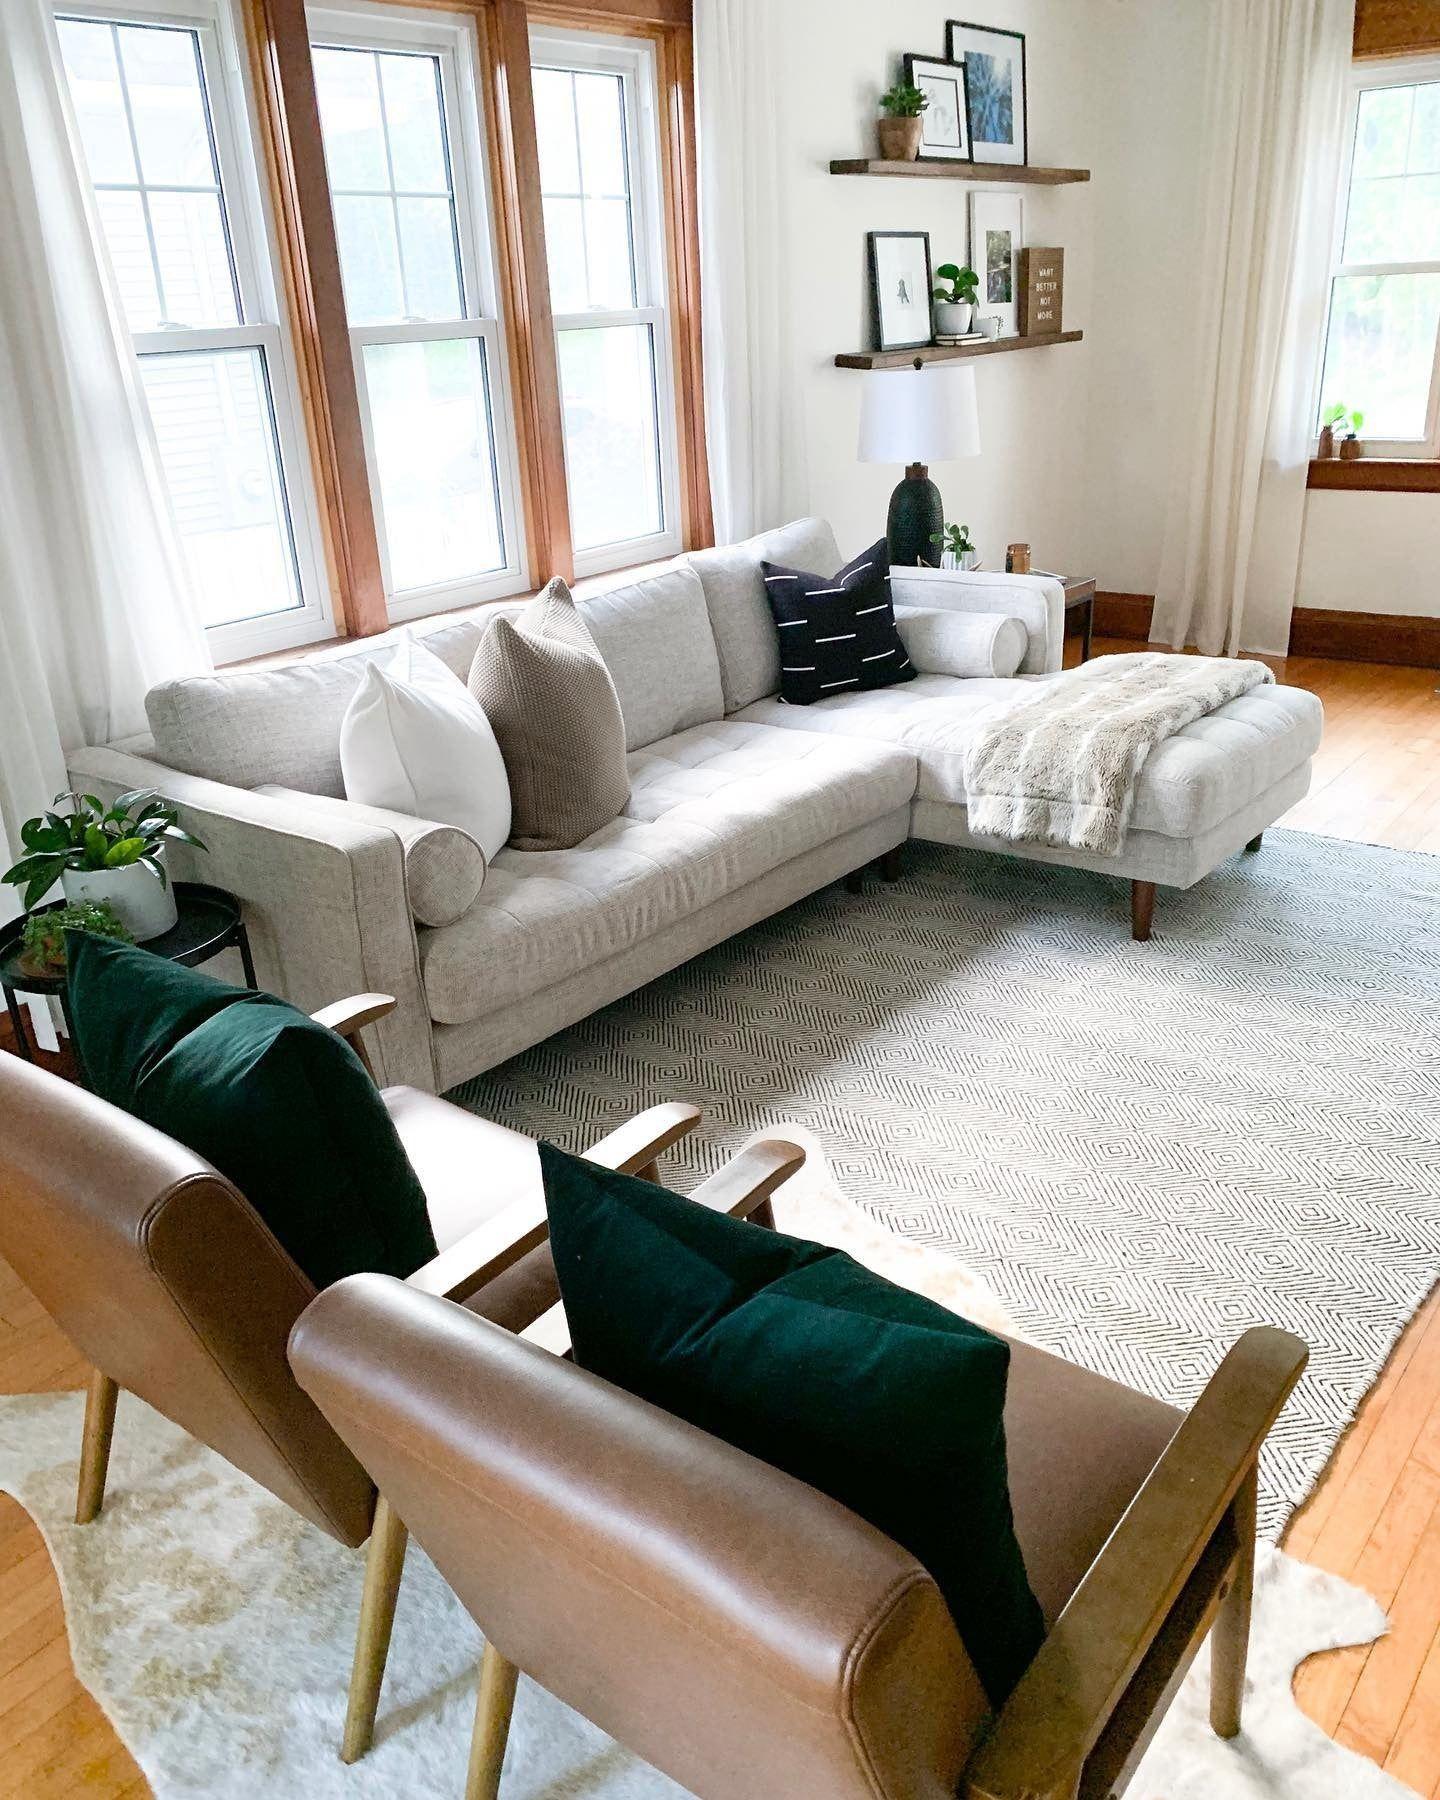 Sven Birch Ivory Right Sectional Sofa Sectional Sofa Mid Century Modern Sectional Sofa Grey Sectional Sofa